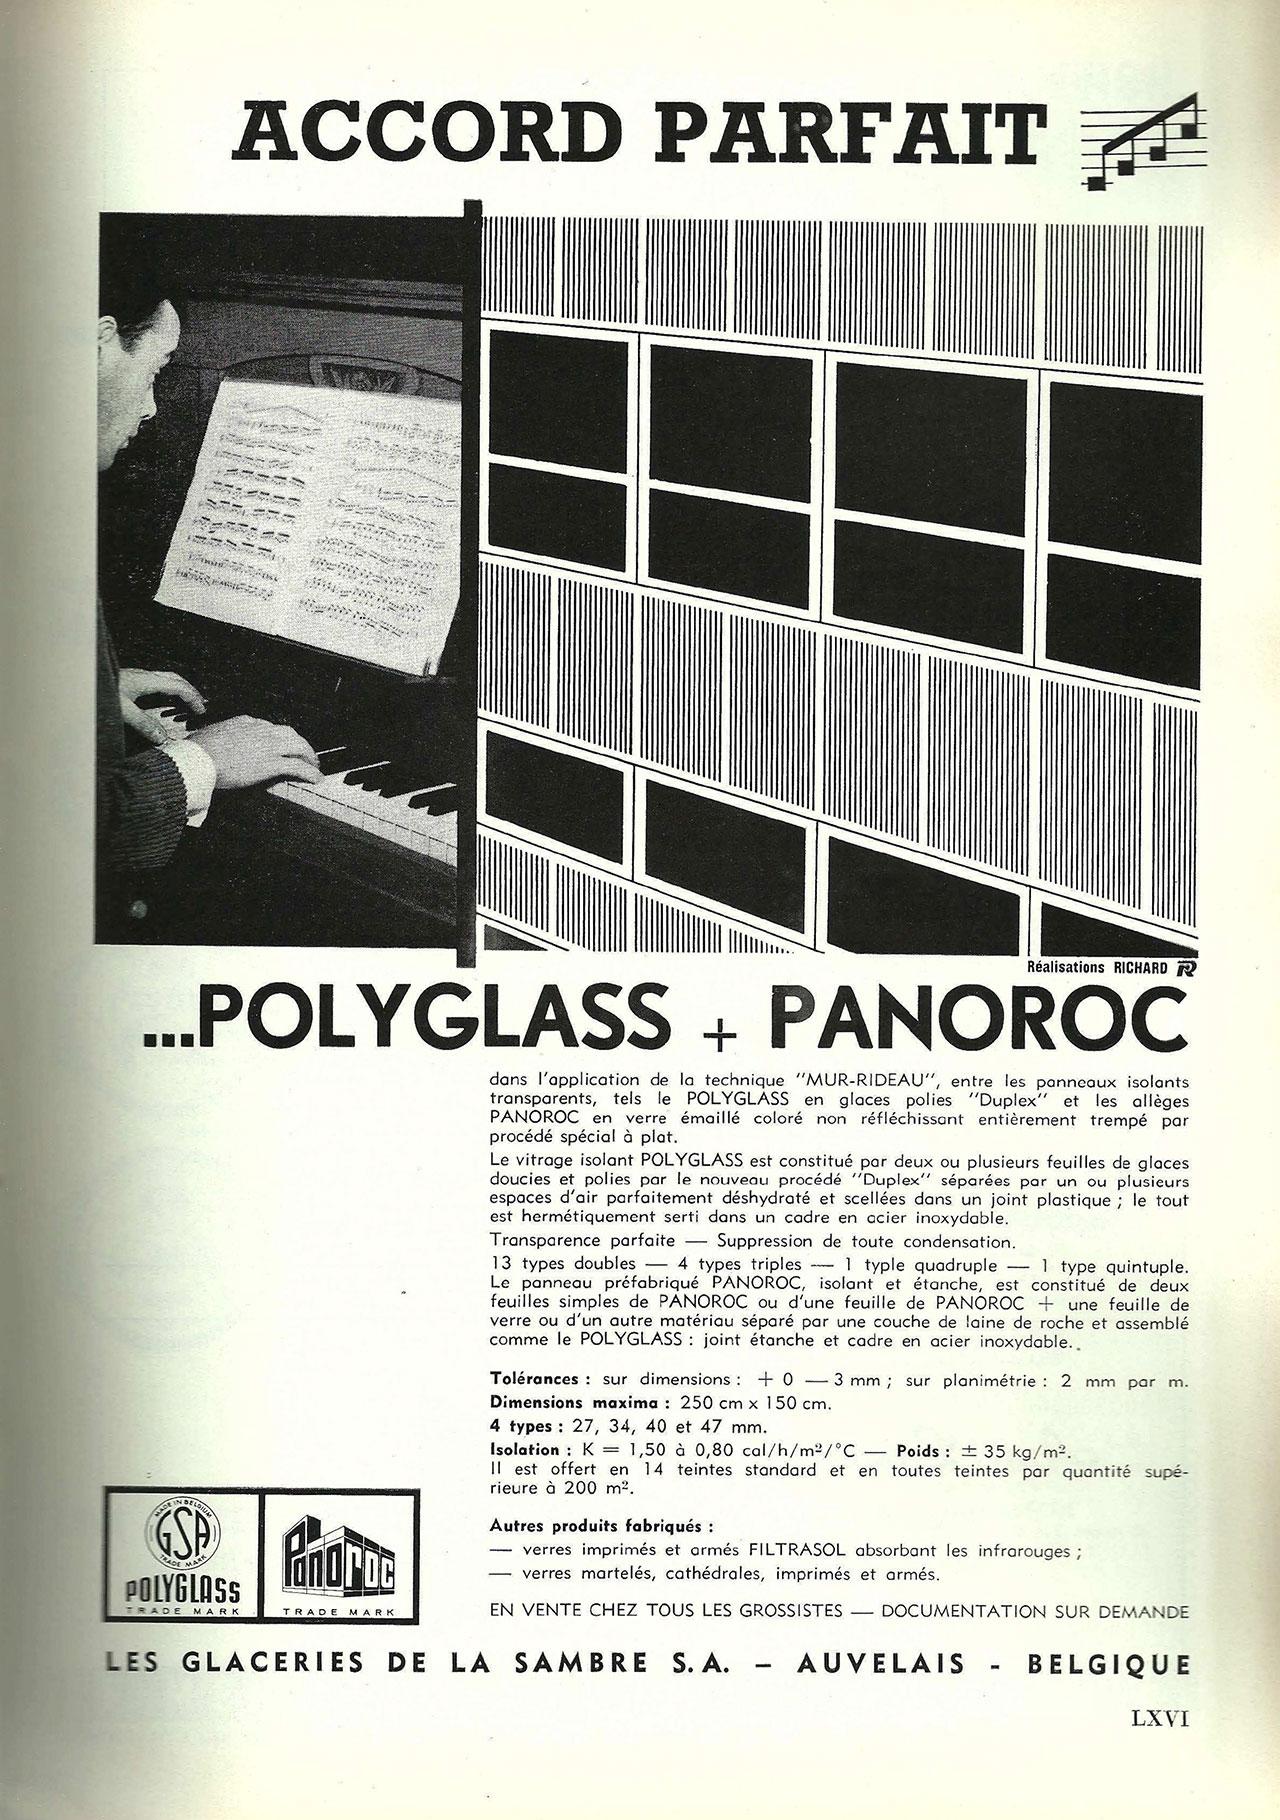 Polyglass, Panoroc